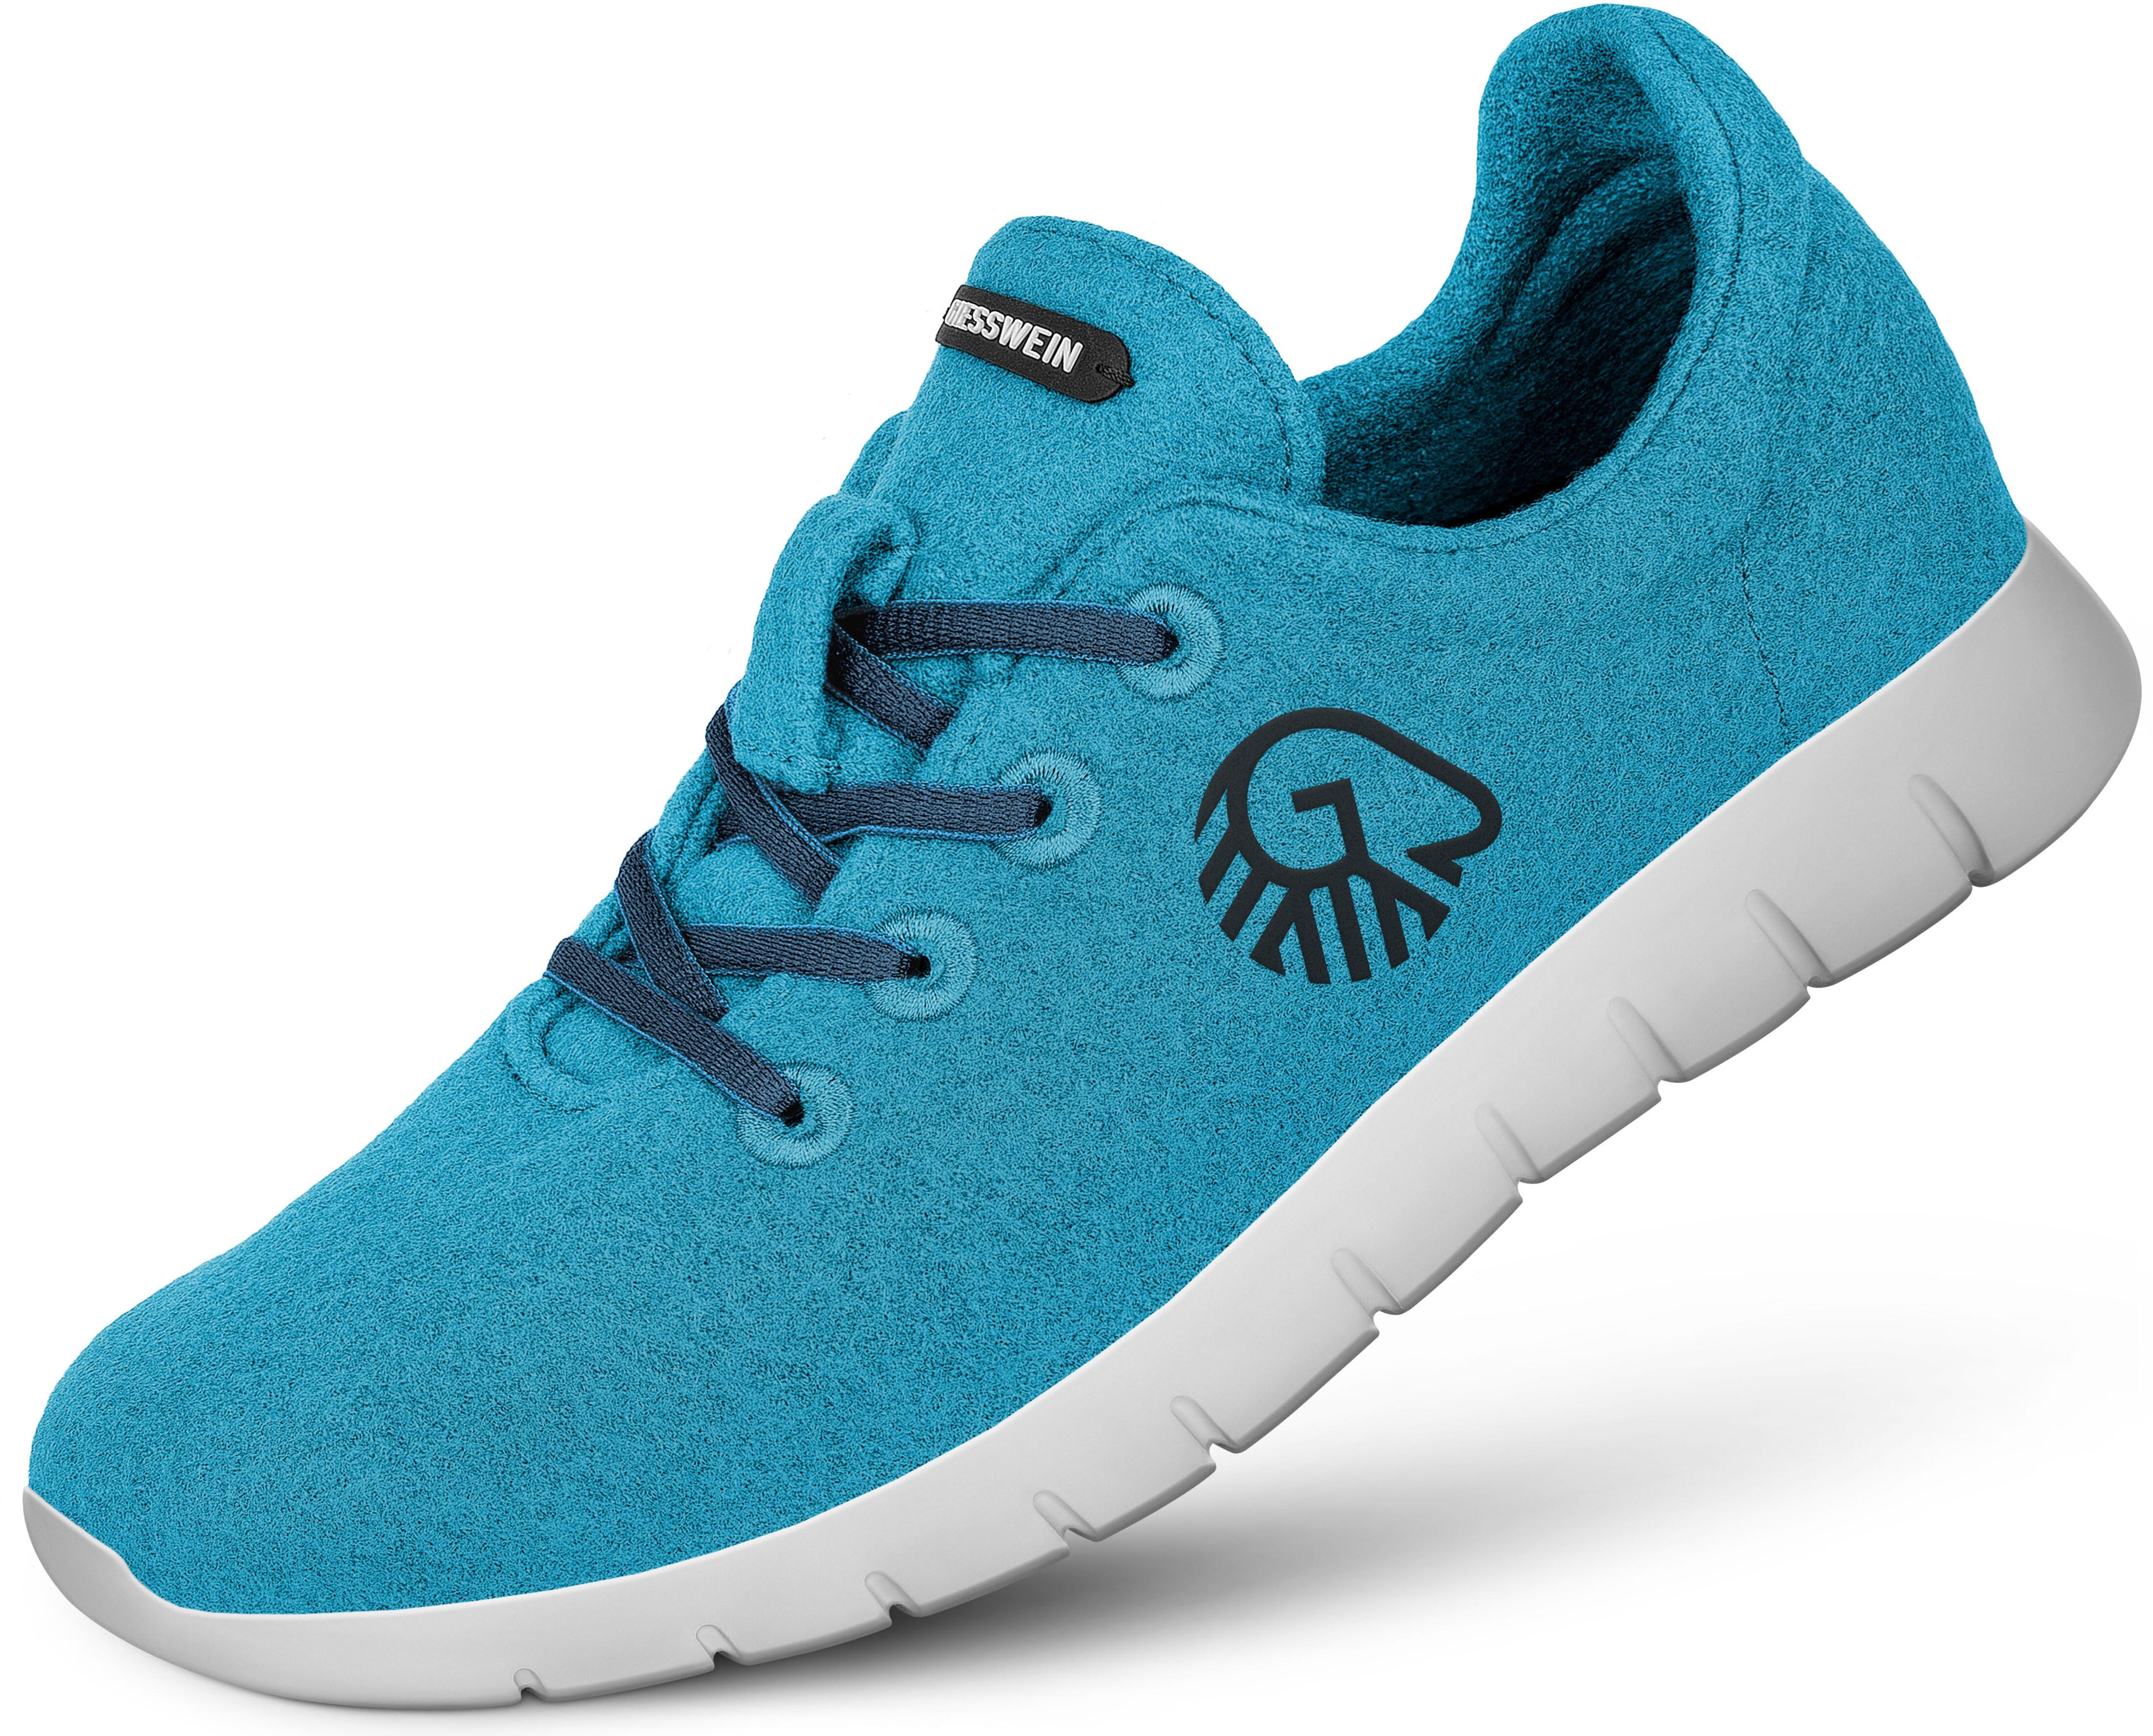 40509d8ec686 Giesswein Merino Wool - Chaussures Femme - turquoise sur CAMPZ !